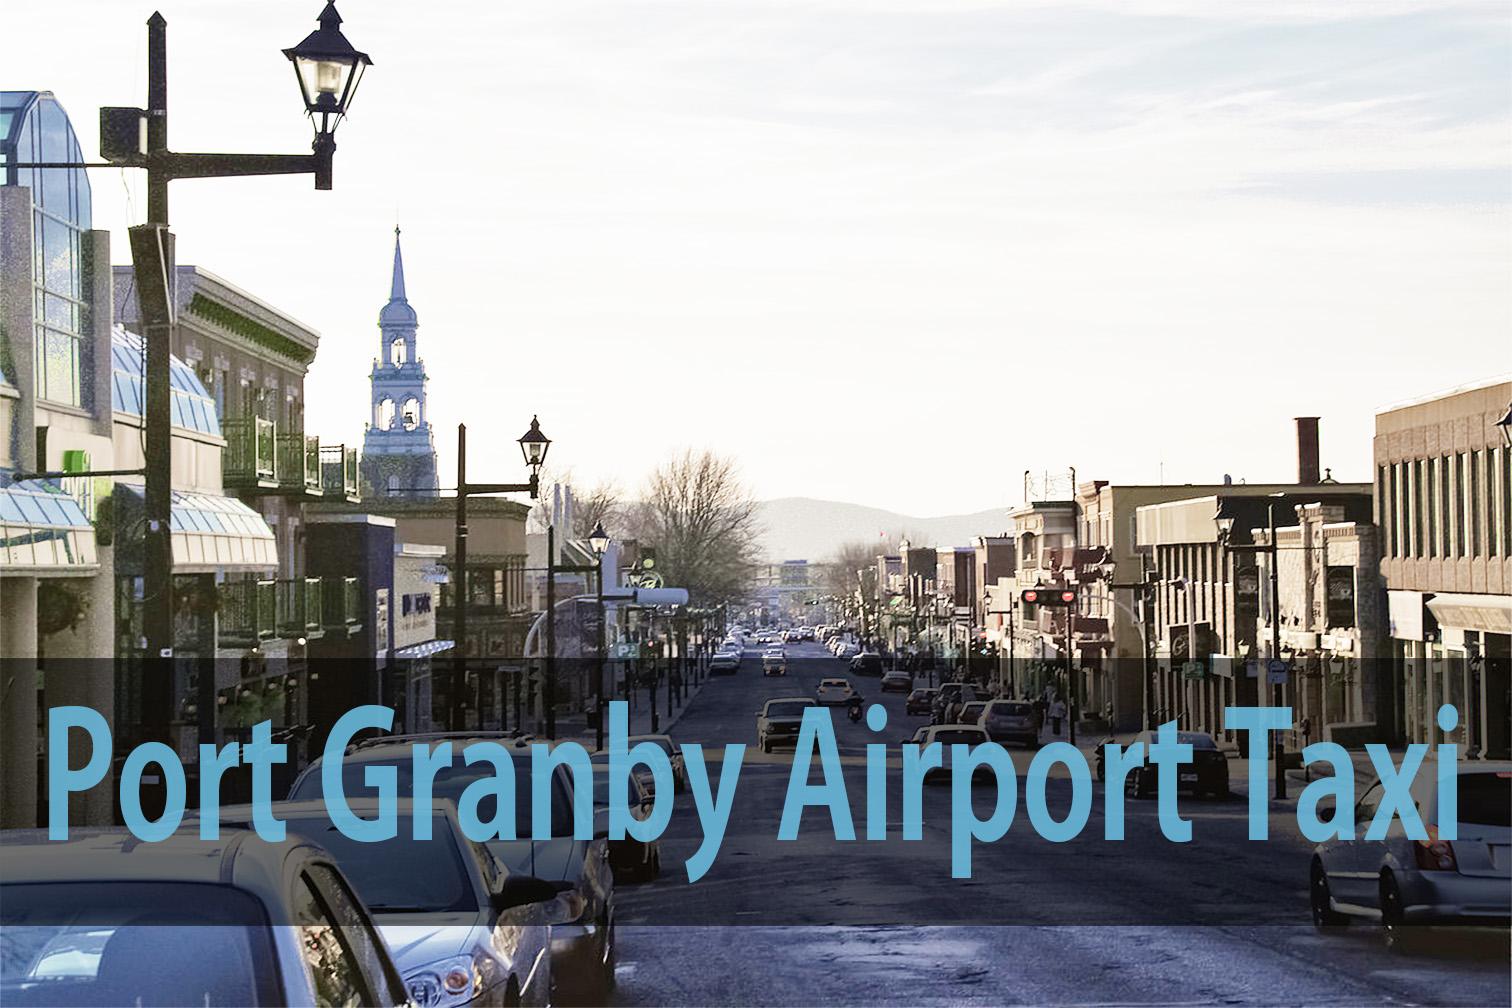 Port Granby airport taxi